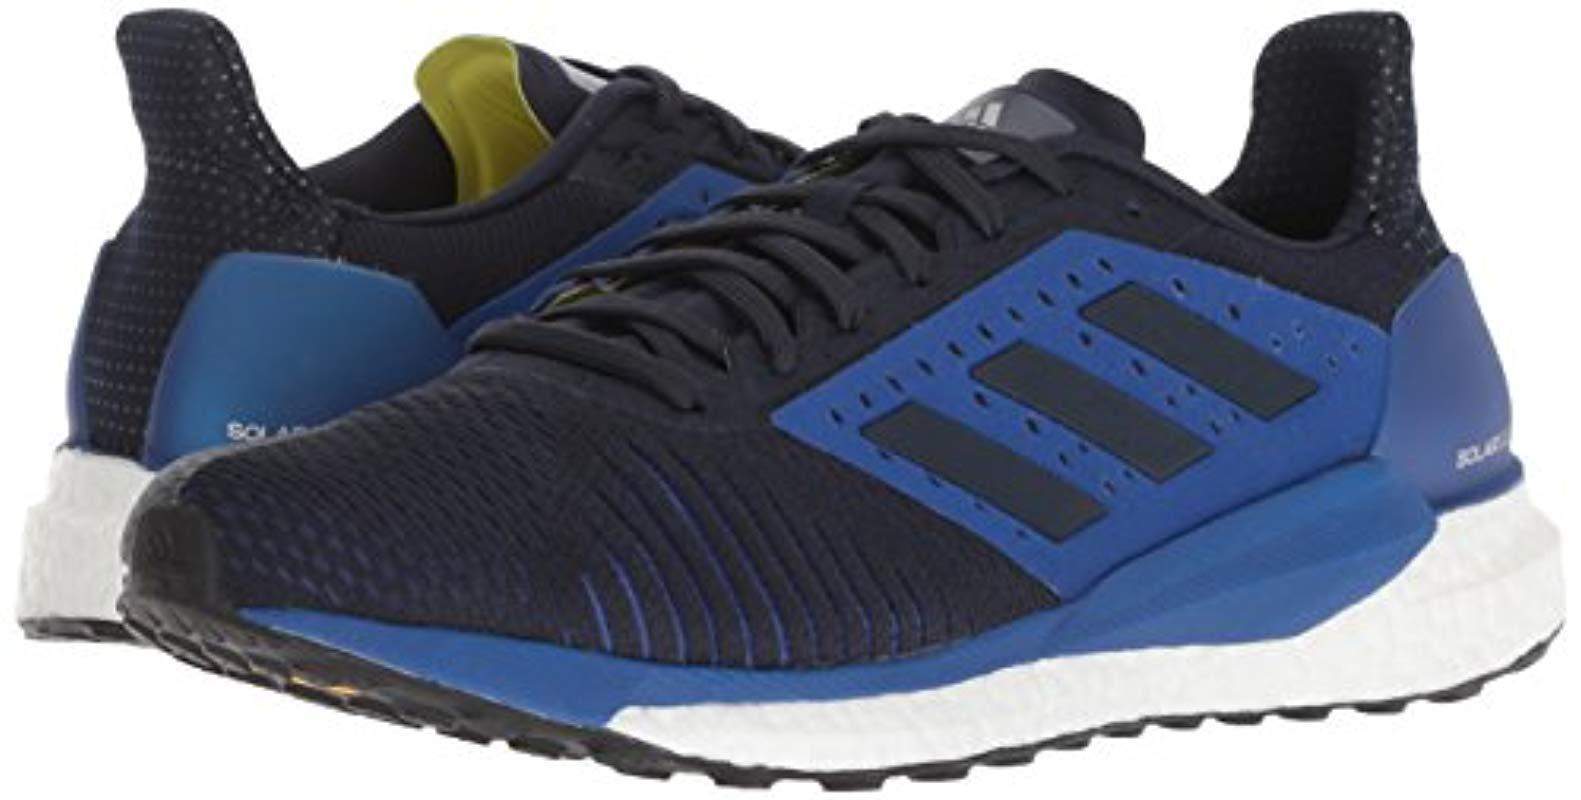 adidas Rubber Originals Solar Glide St Running Shoe in Blue for Men